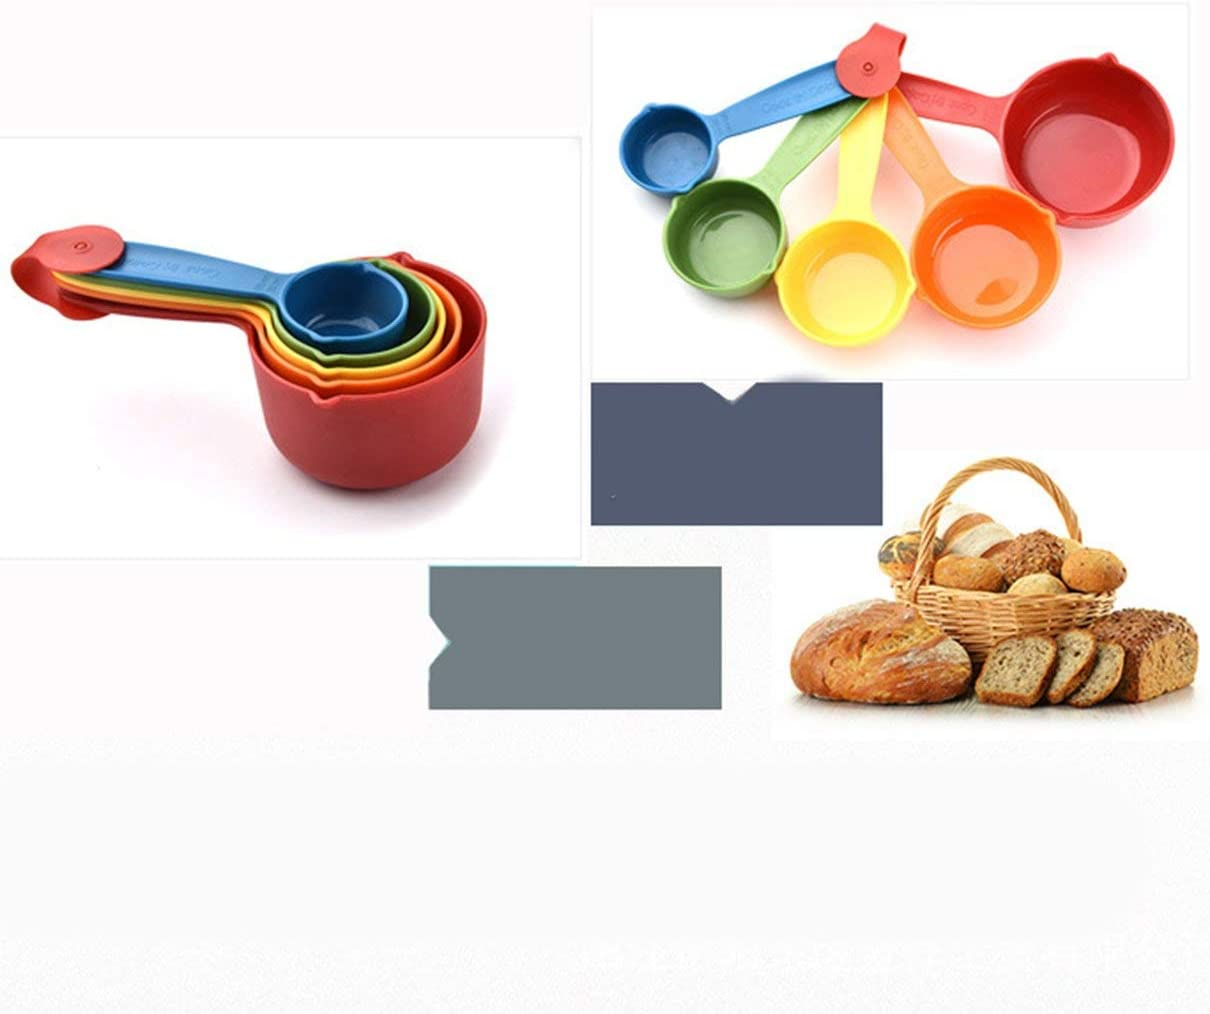 5 Pcs//Set Colorful Plastic Kitchen Measuring Cups Ergonomic Handle Sugar Cake Baking Spoon Household Measuring Scoop